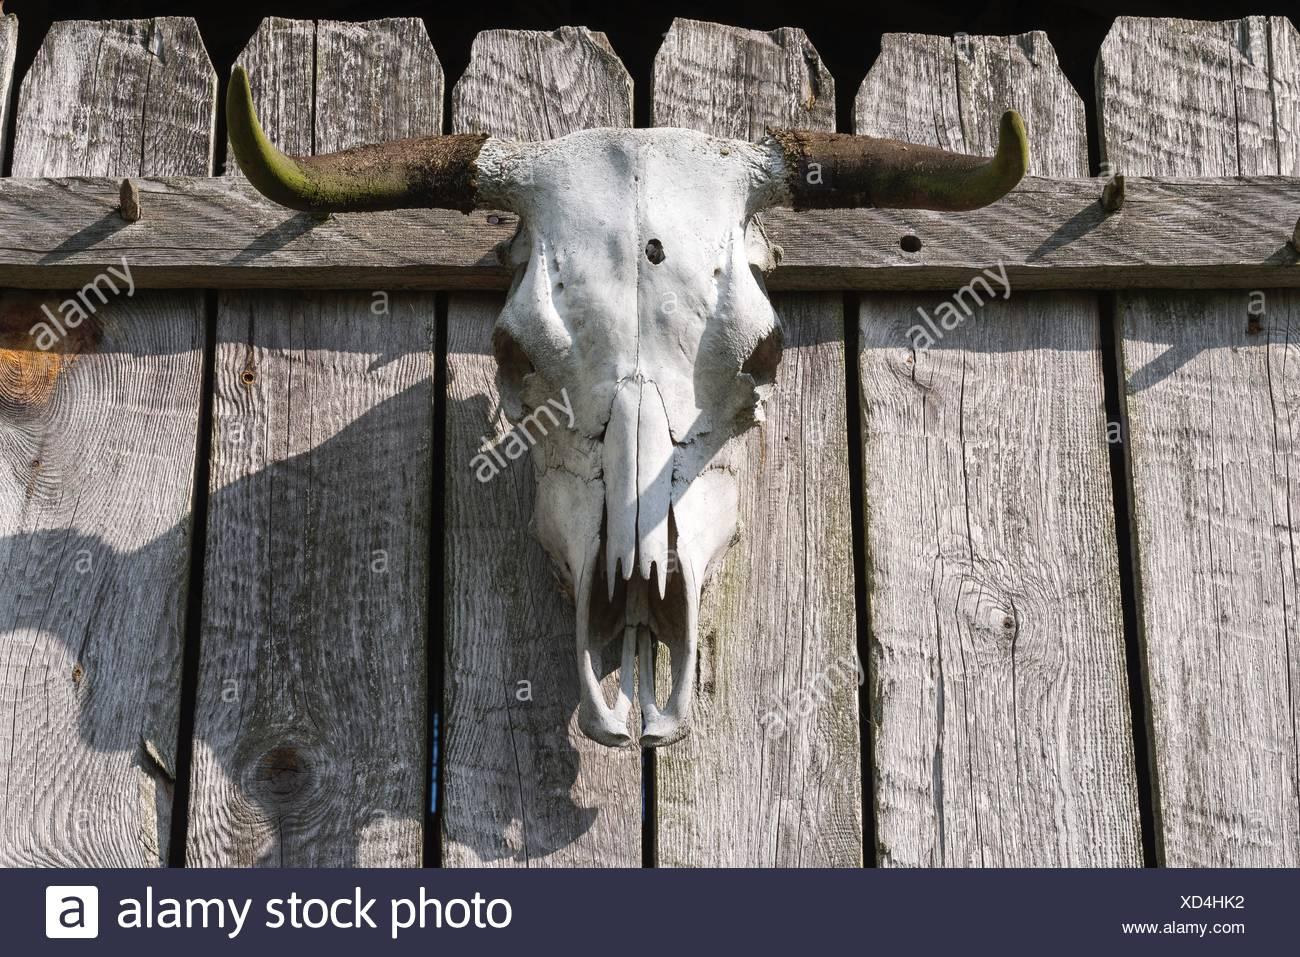 Bull skull with bullet hole, on fence, Mecklenburg-Vorpommern, Germany - Stock Image